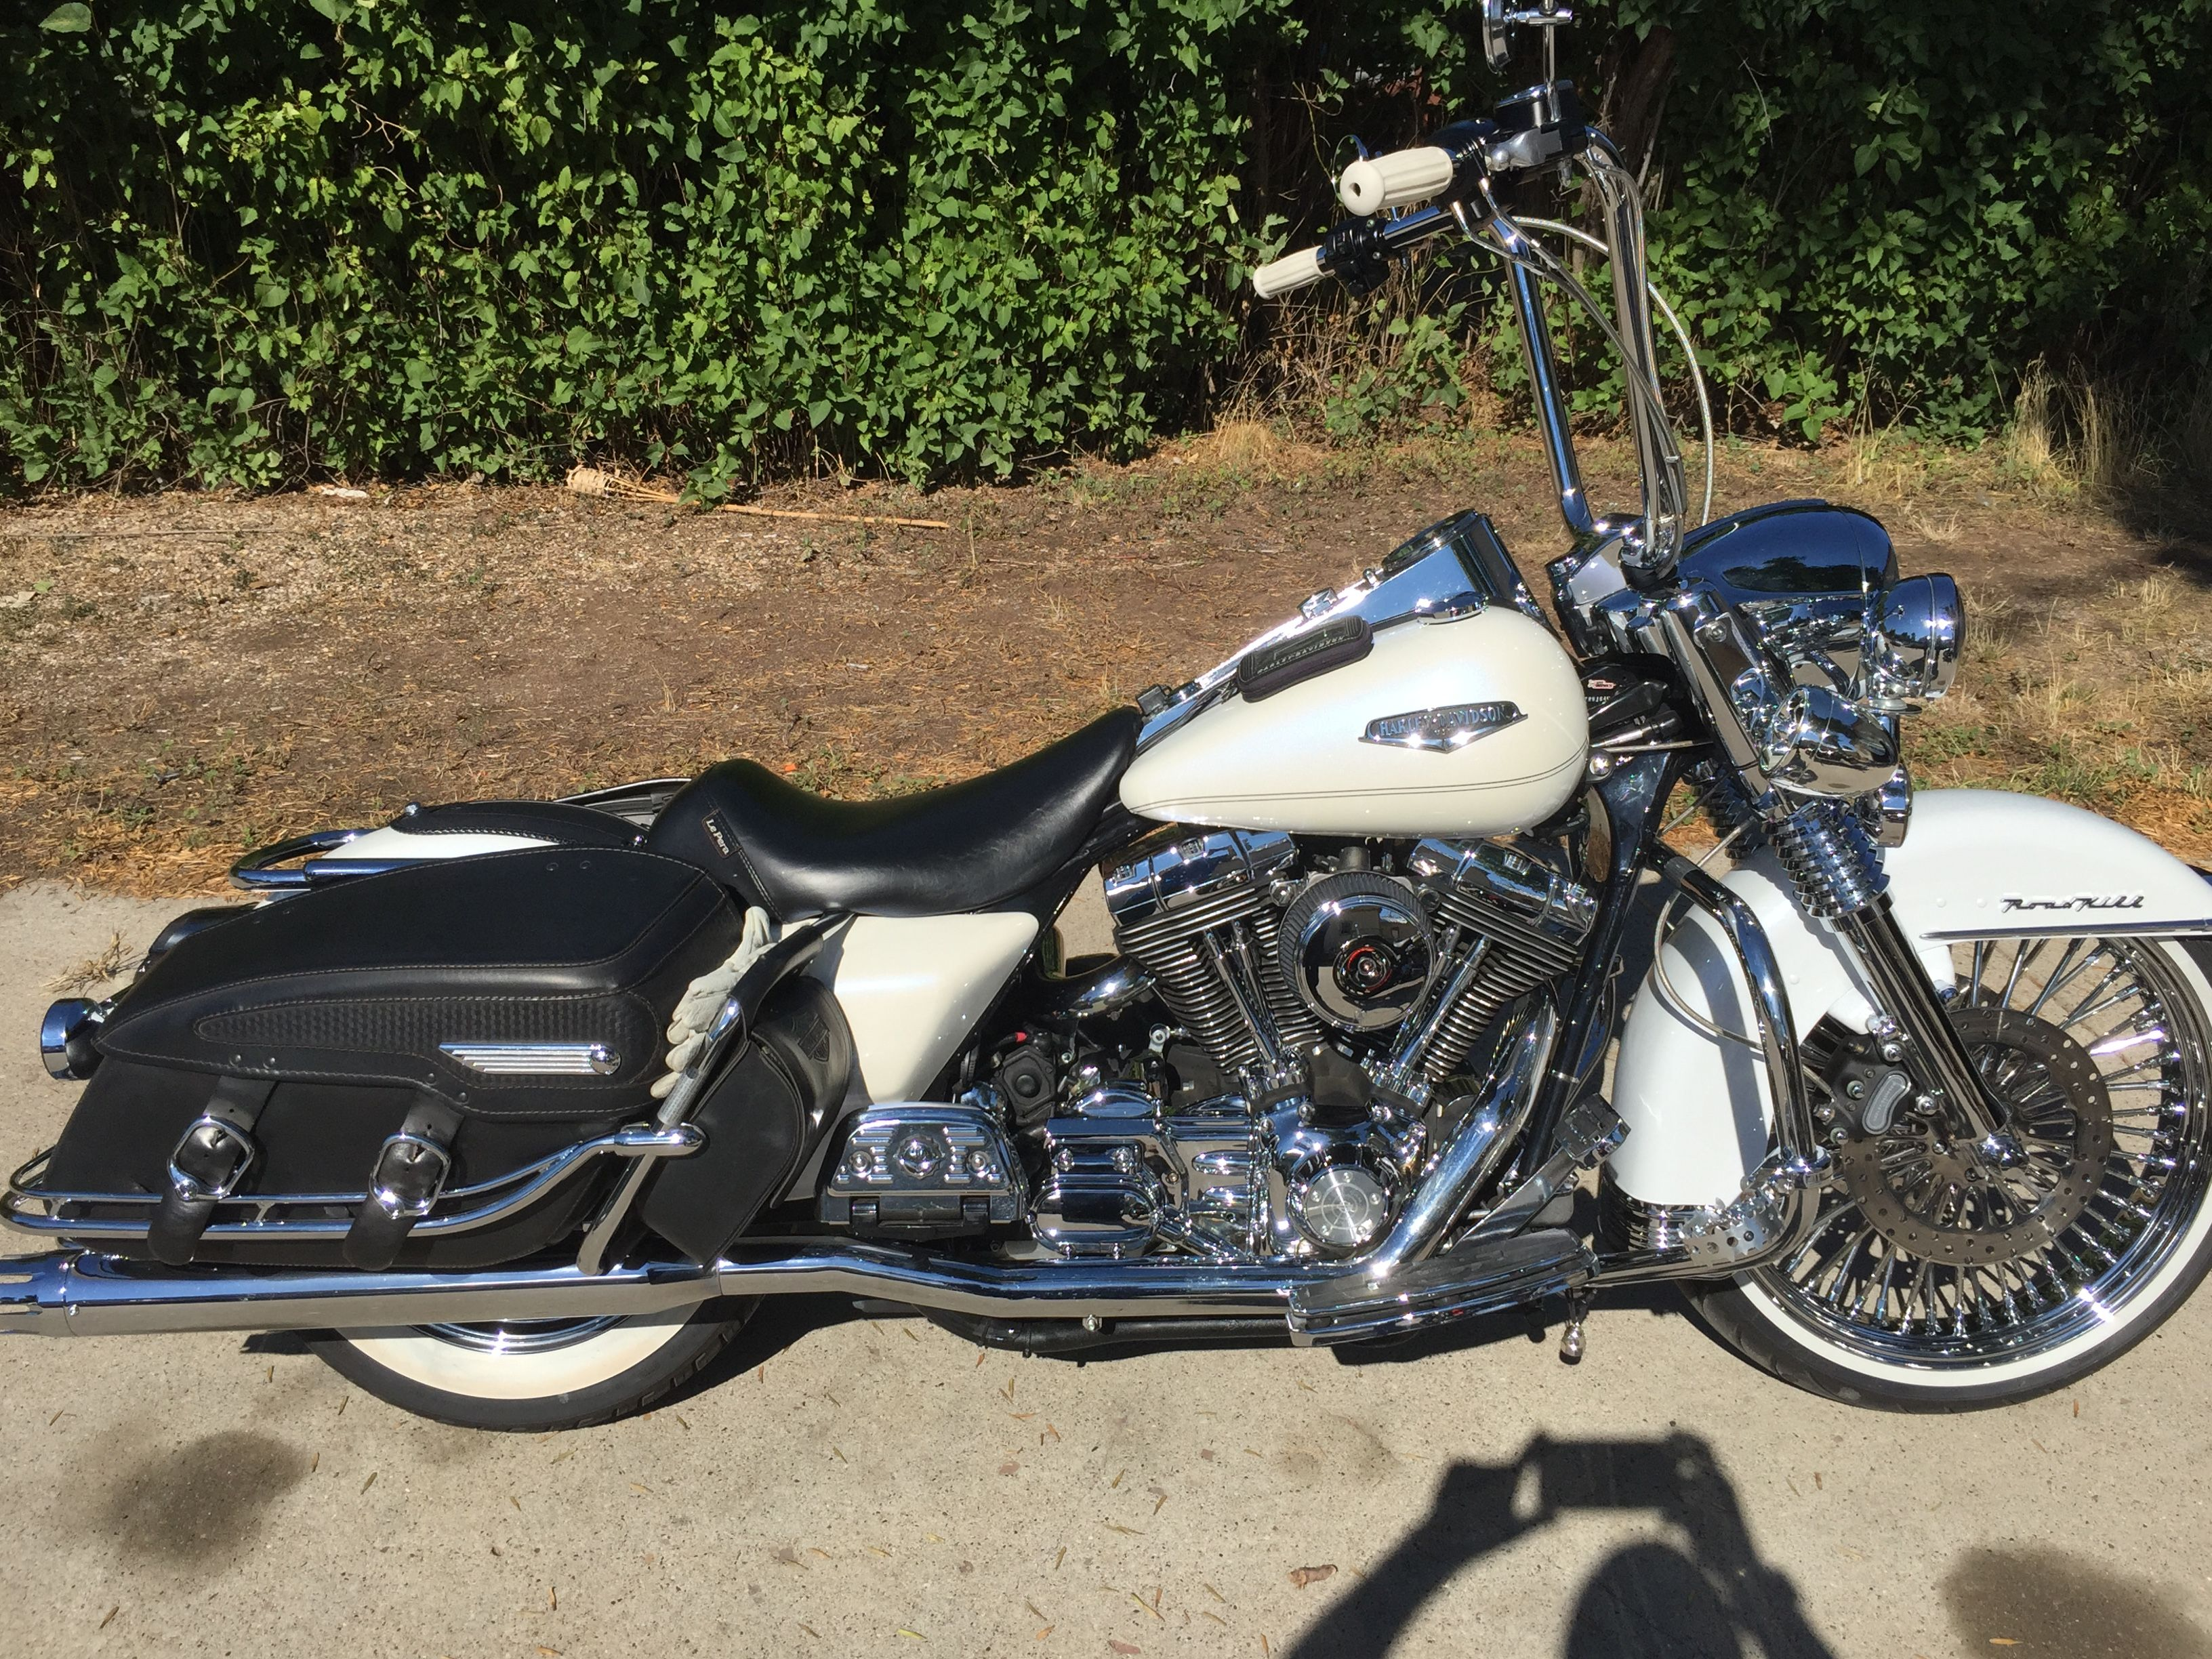 04 Road King Classic | Harley Davidson Road King | Pinterest | Road ...